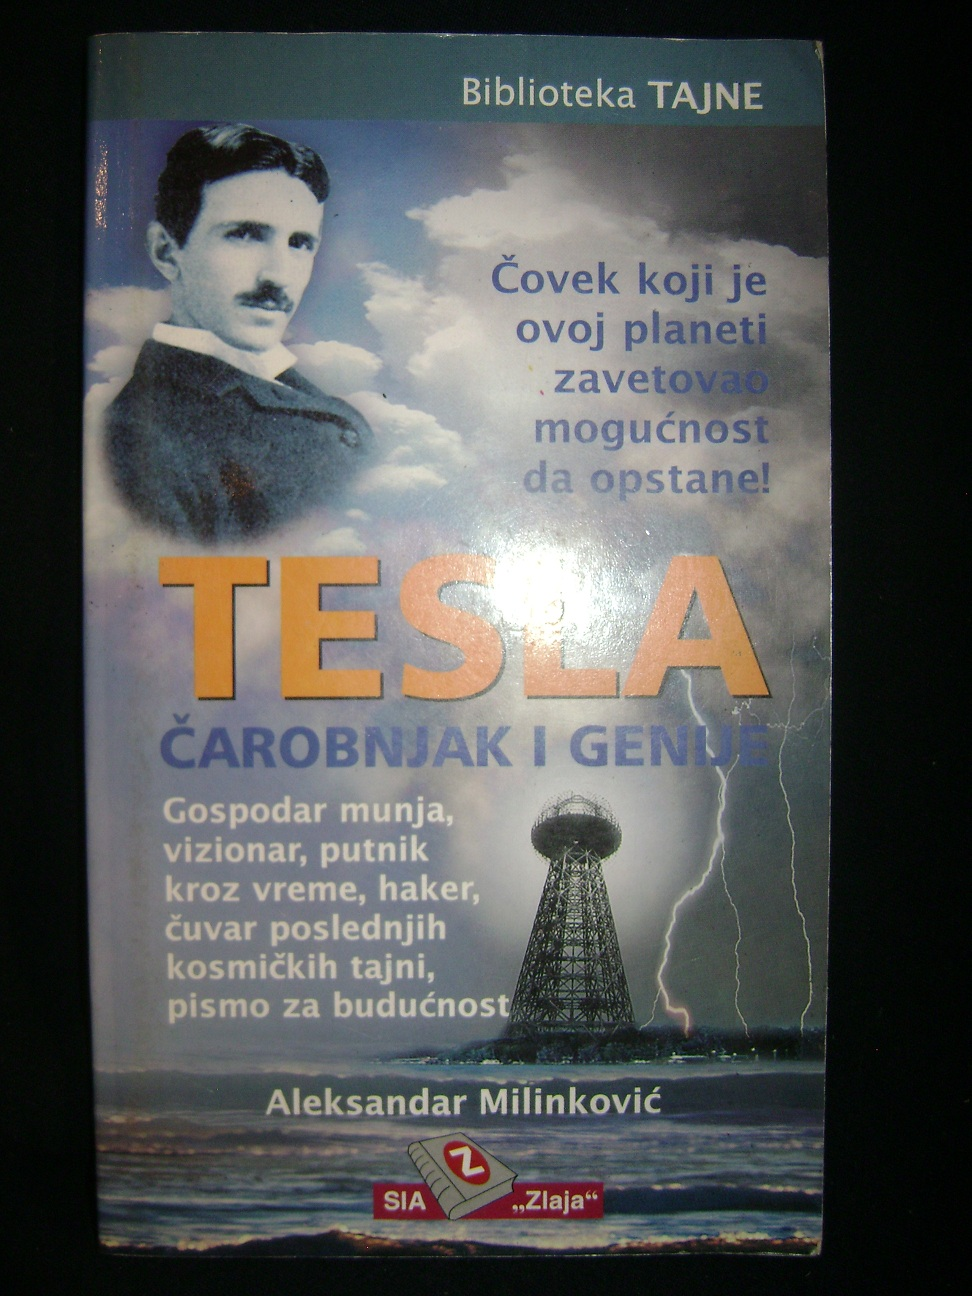 TESLA_ČAROBNJAK_I_GENIJE_Aleksandar_Milinkovic_1.JPG